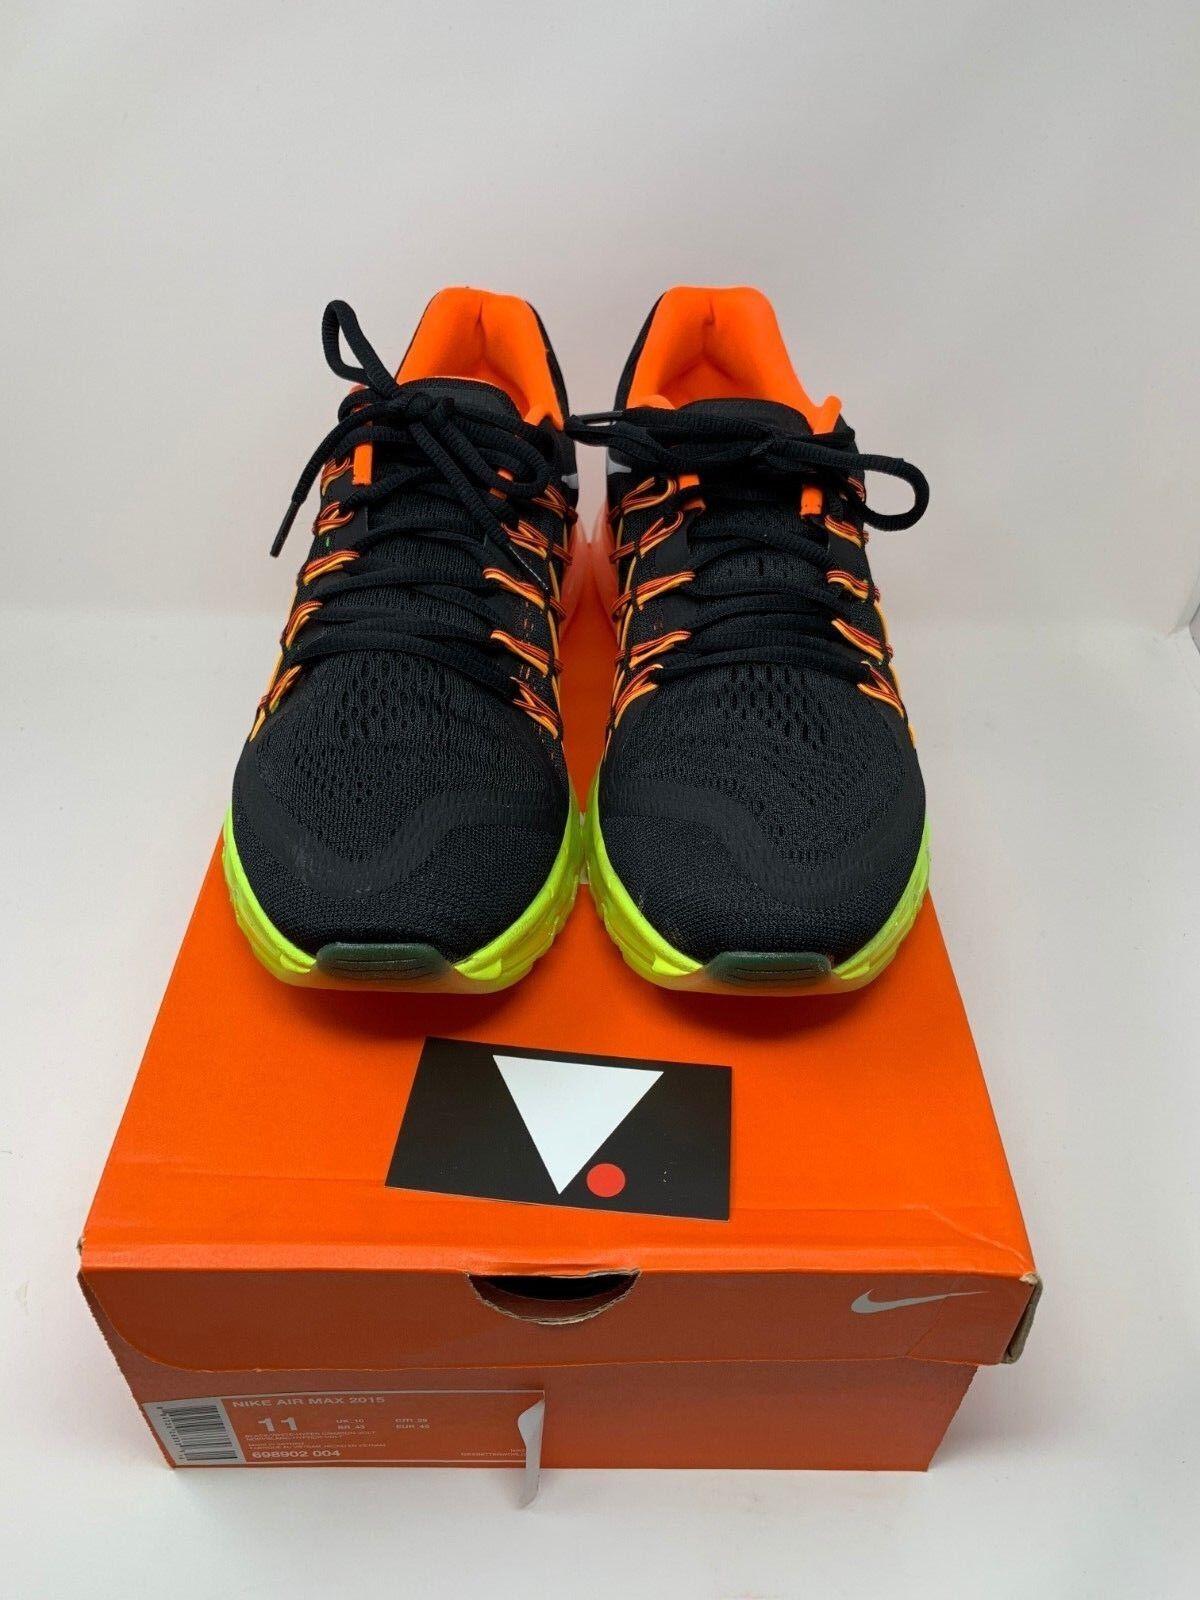 Nike air max 2015 2015 max schwarze hyper - 698902 004 cremefarbene reagieren vapormax ba336e